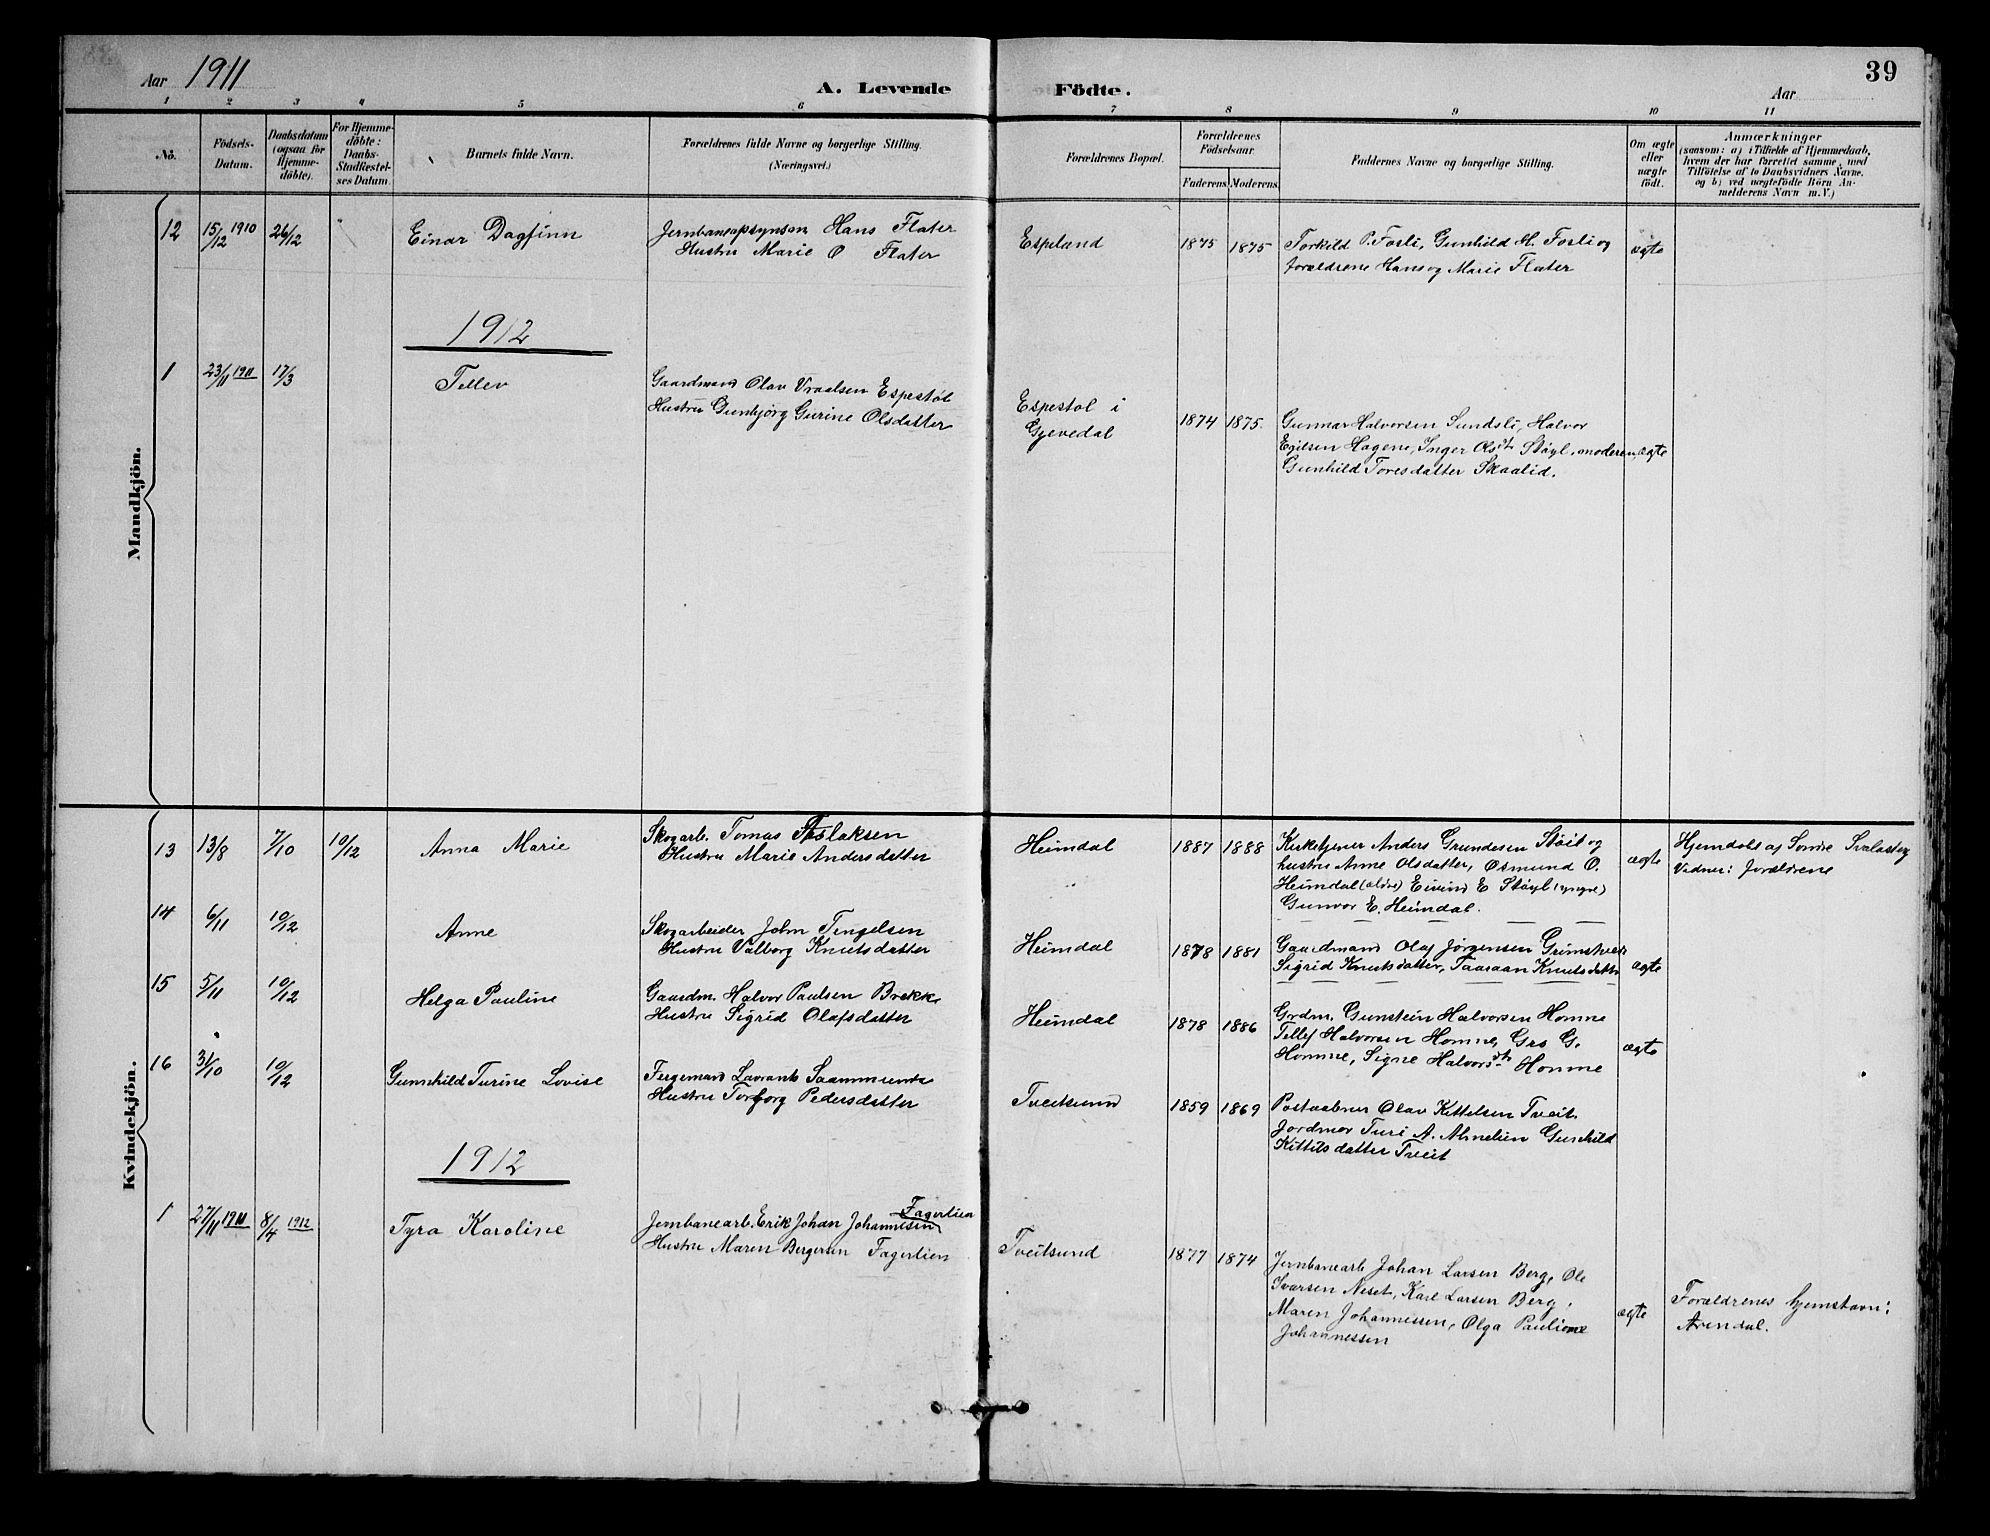 SAKO, Nissedal kirkebøker, G/Gb/L0003: Klokkerbok nr. II 3, 1893-1928, s. 39